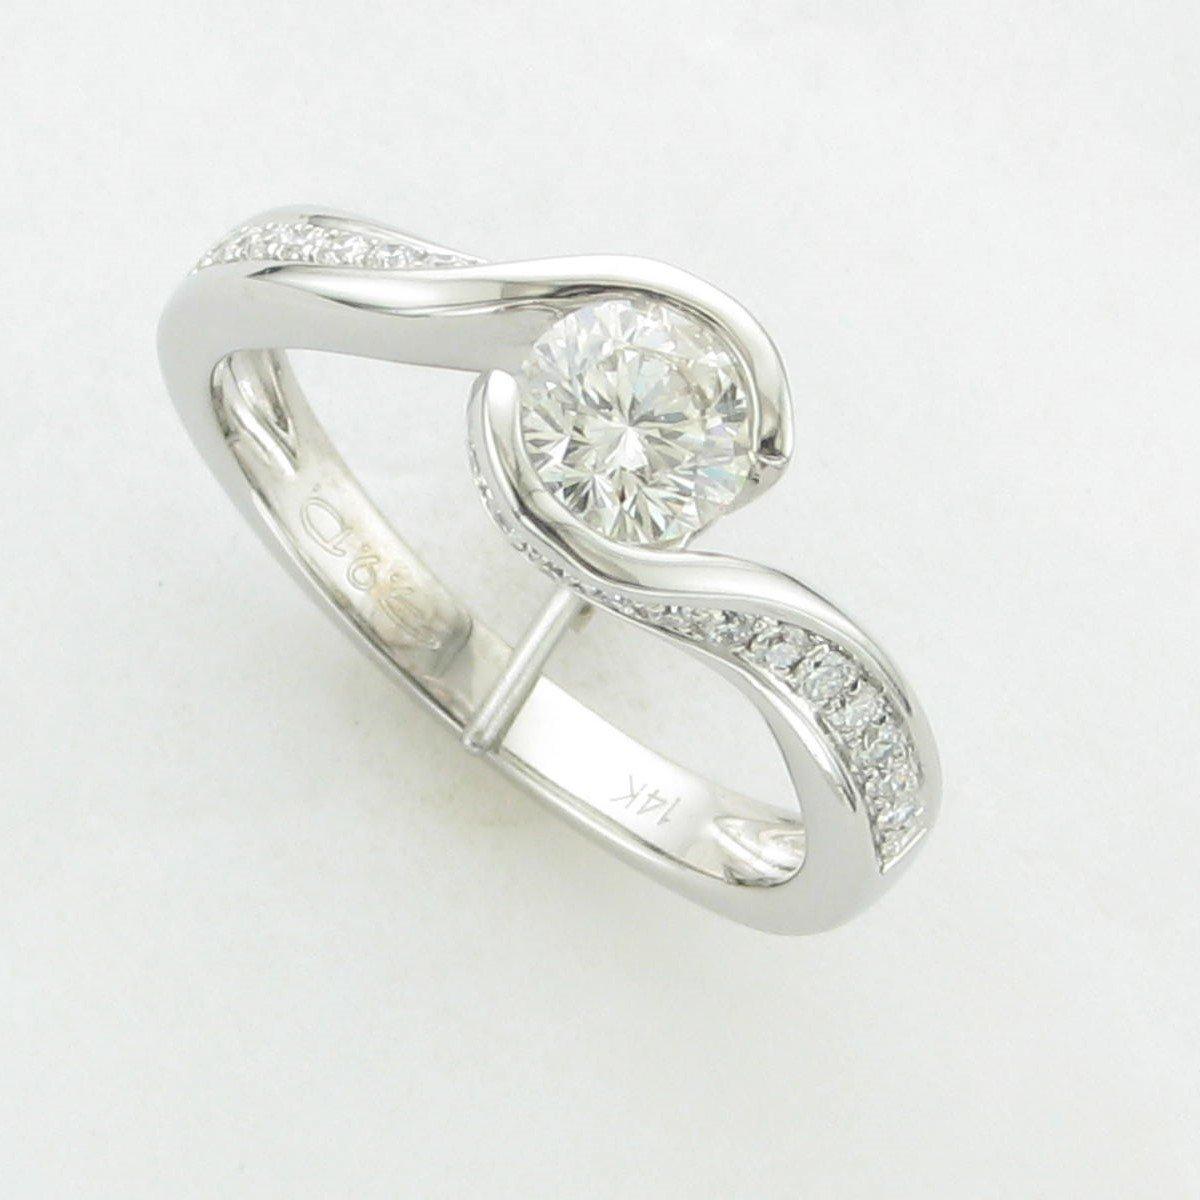 0.58ct. Round Diamond Ring set in 14K White Gold